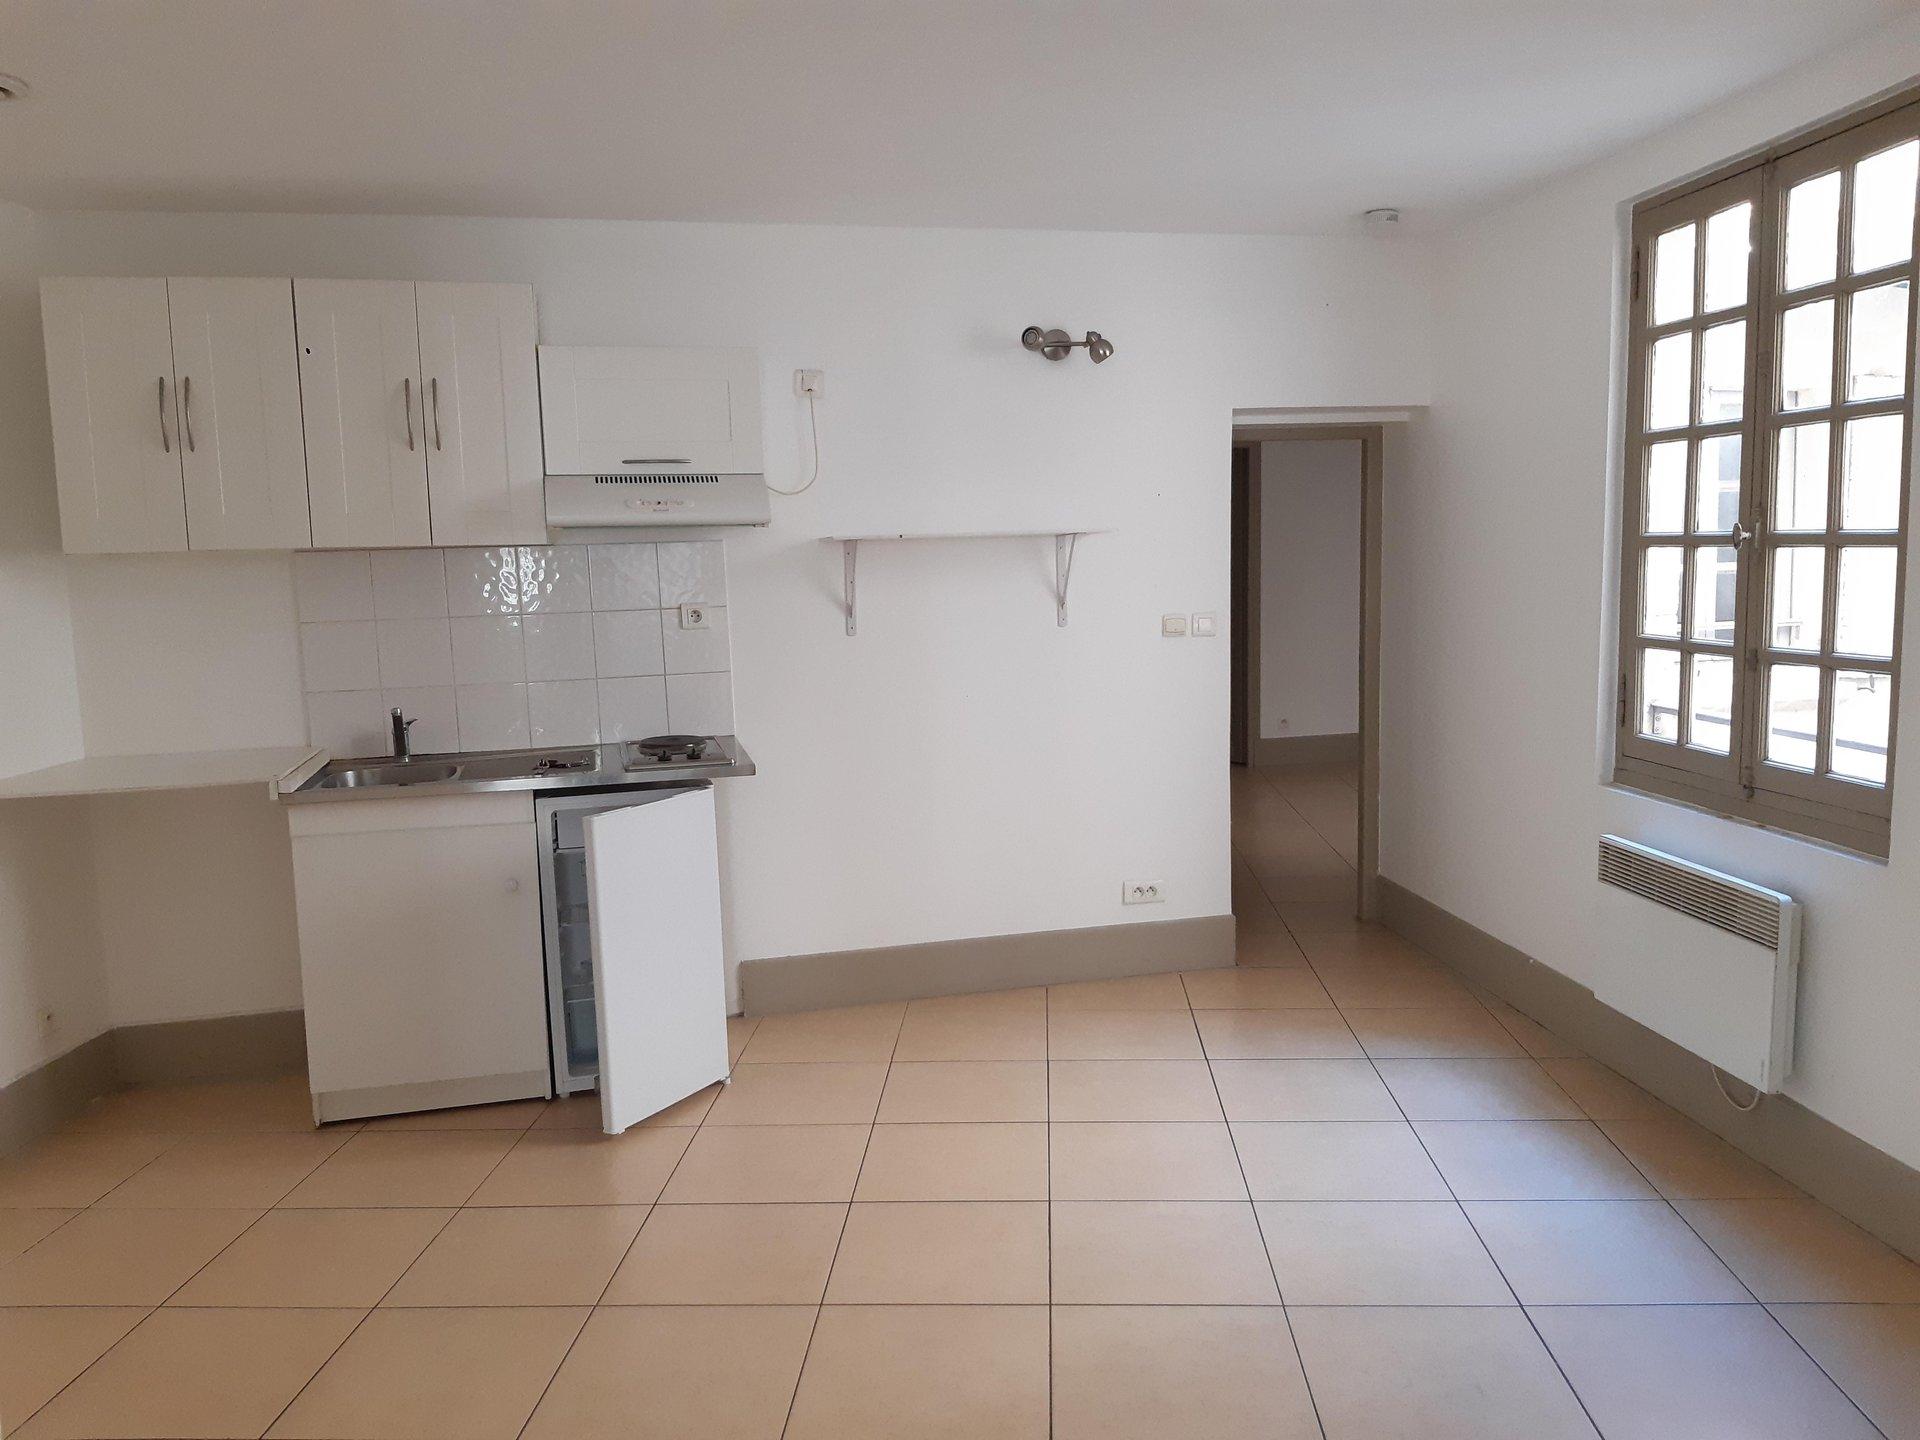 Location Appartement ARLES 1 salles de bain